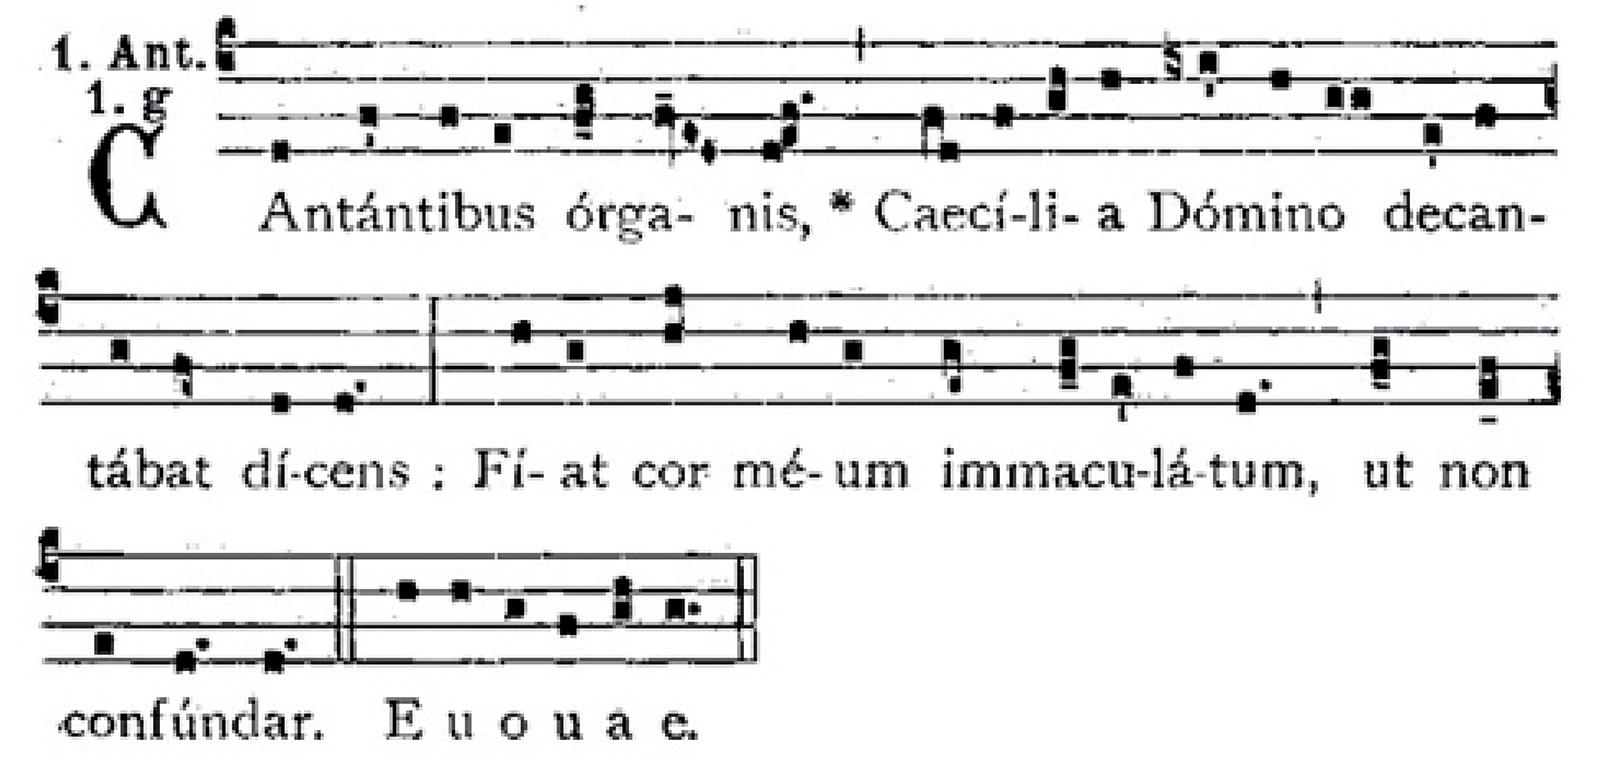 cantantibus organis